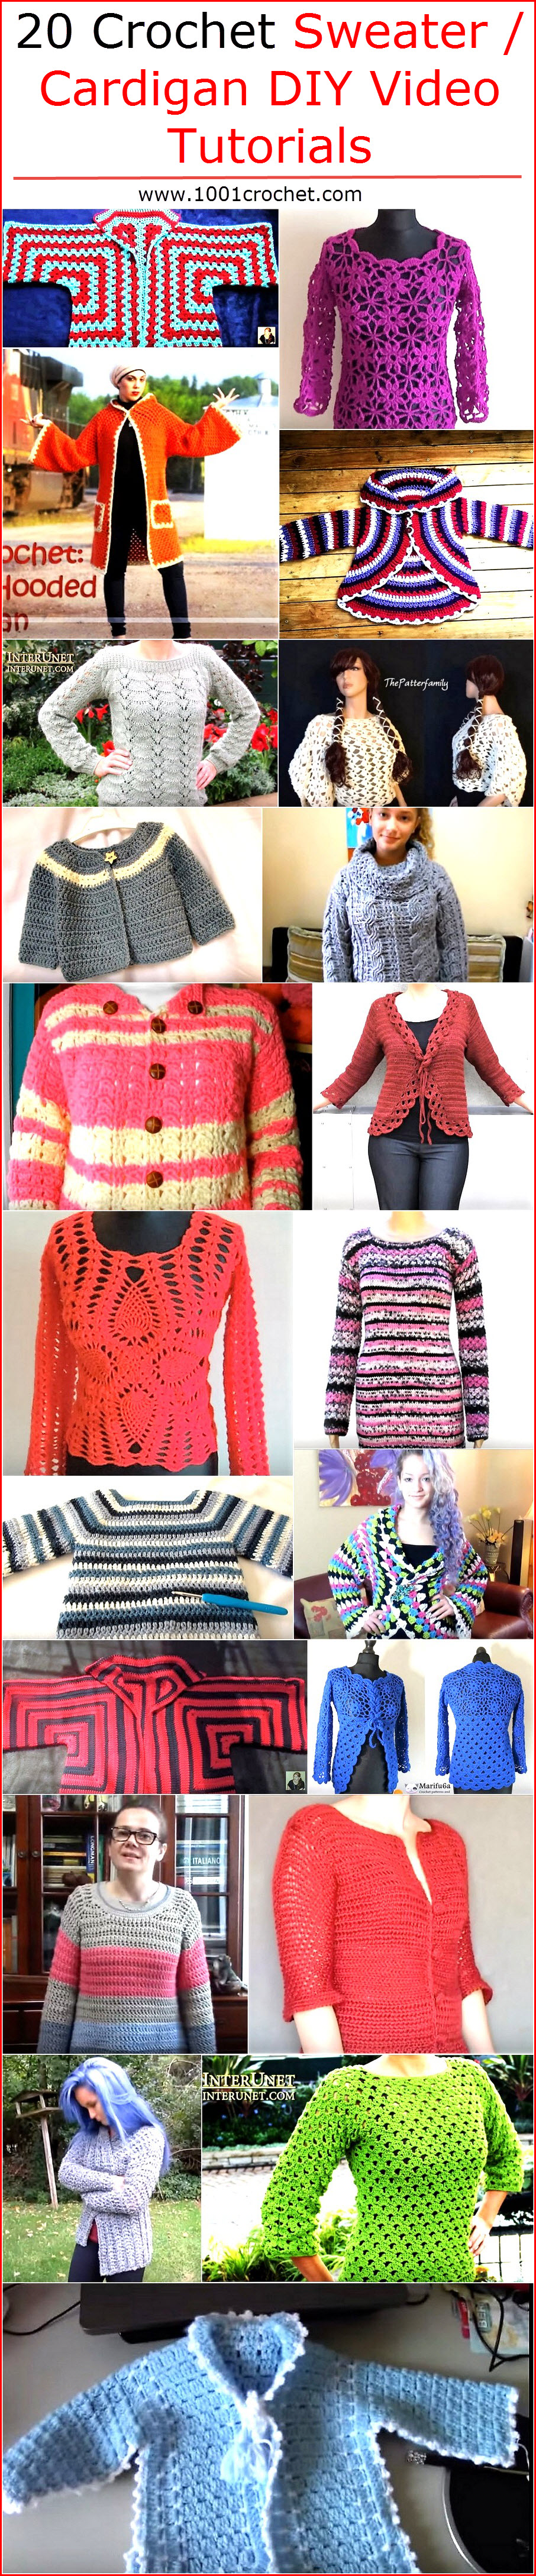 20-crochet-sweater-cardigan-diy-video-tutorials